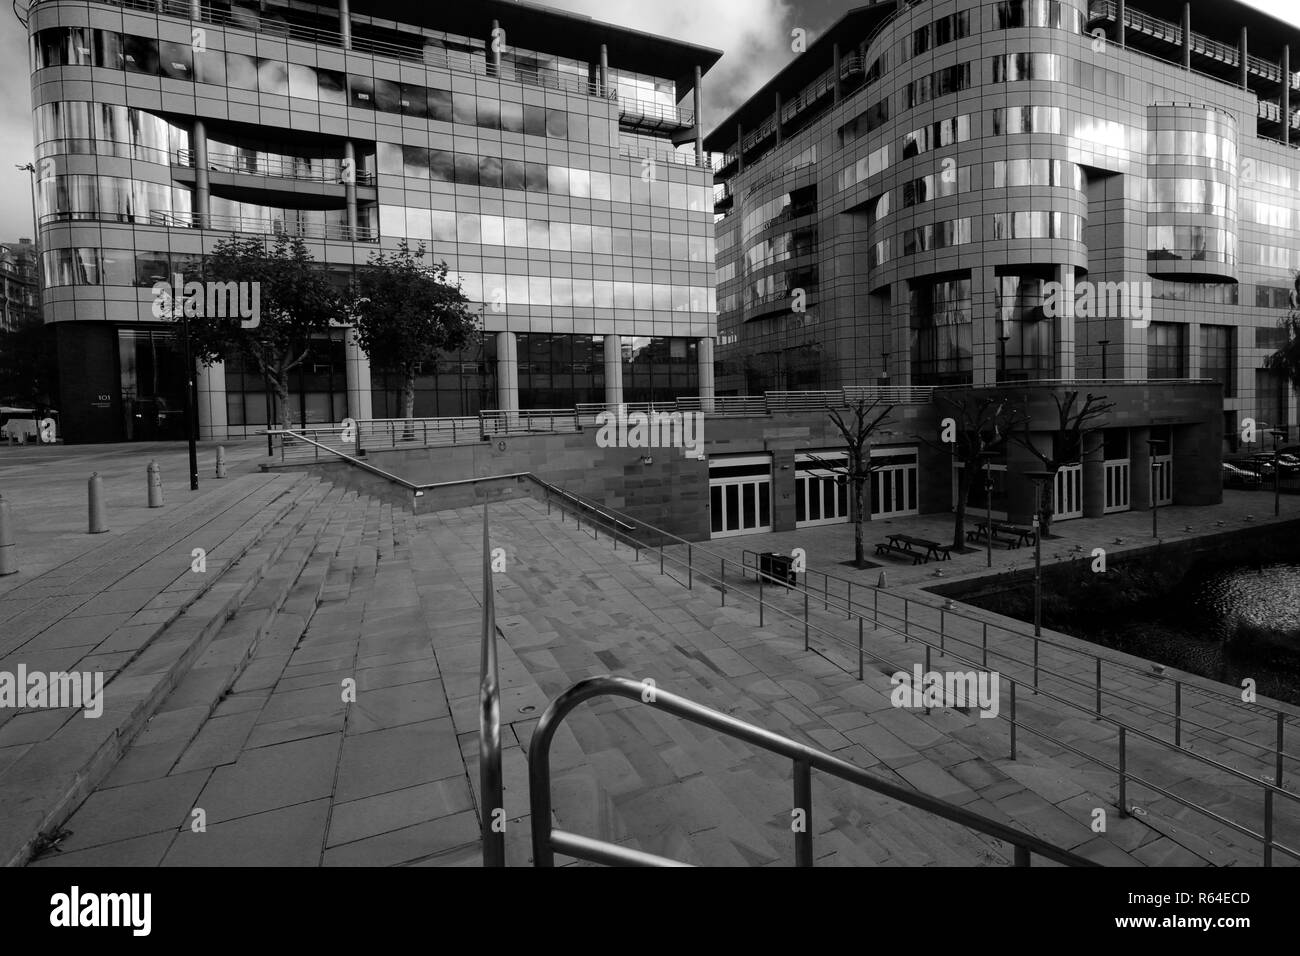 Architecture on Barbarolli Square, Great Bridgewater, Manchester City, Lancashire, England, UK - Stock Image